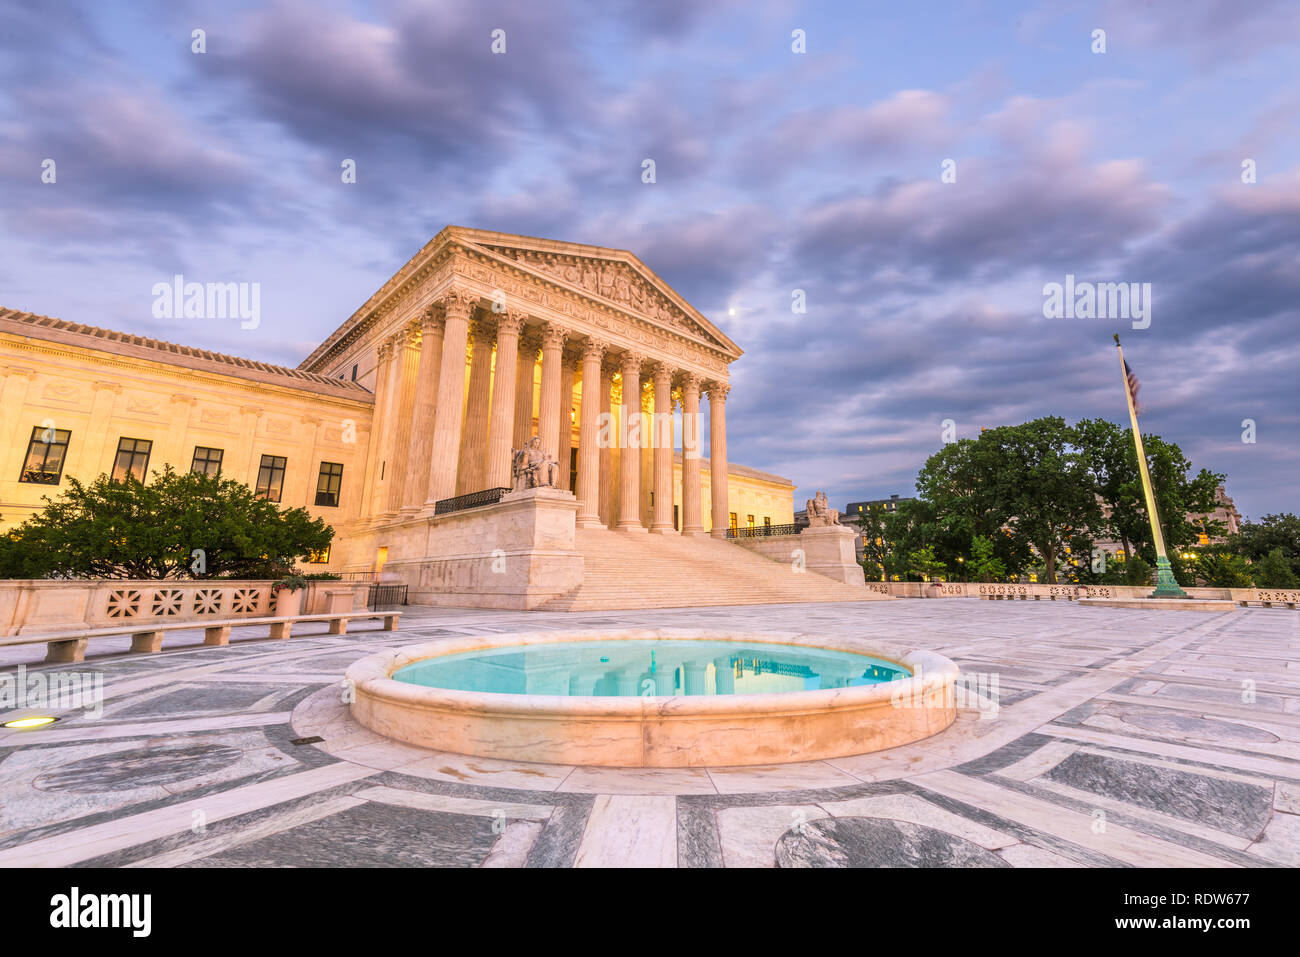 United States Supreme Court Building in Washington, DC, USA. Stock Photo